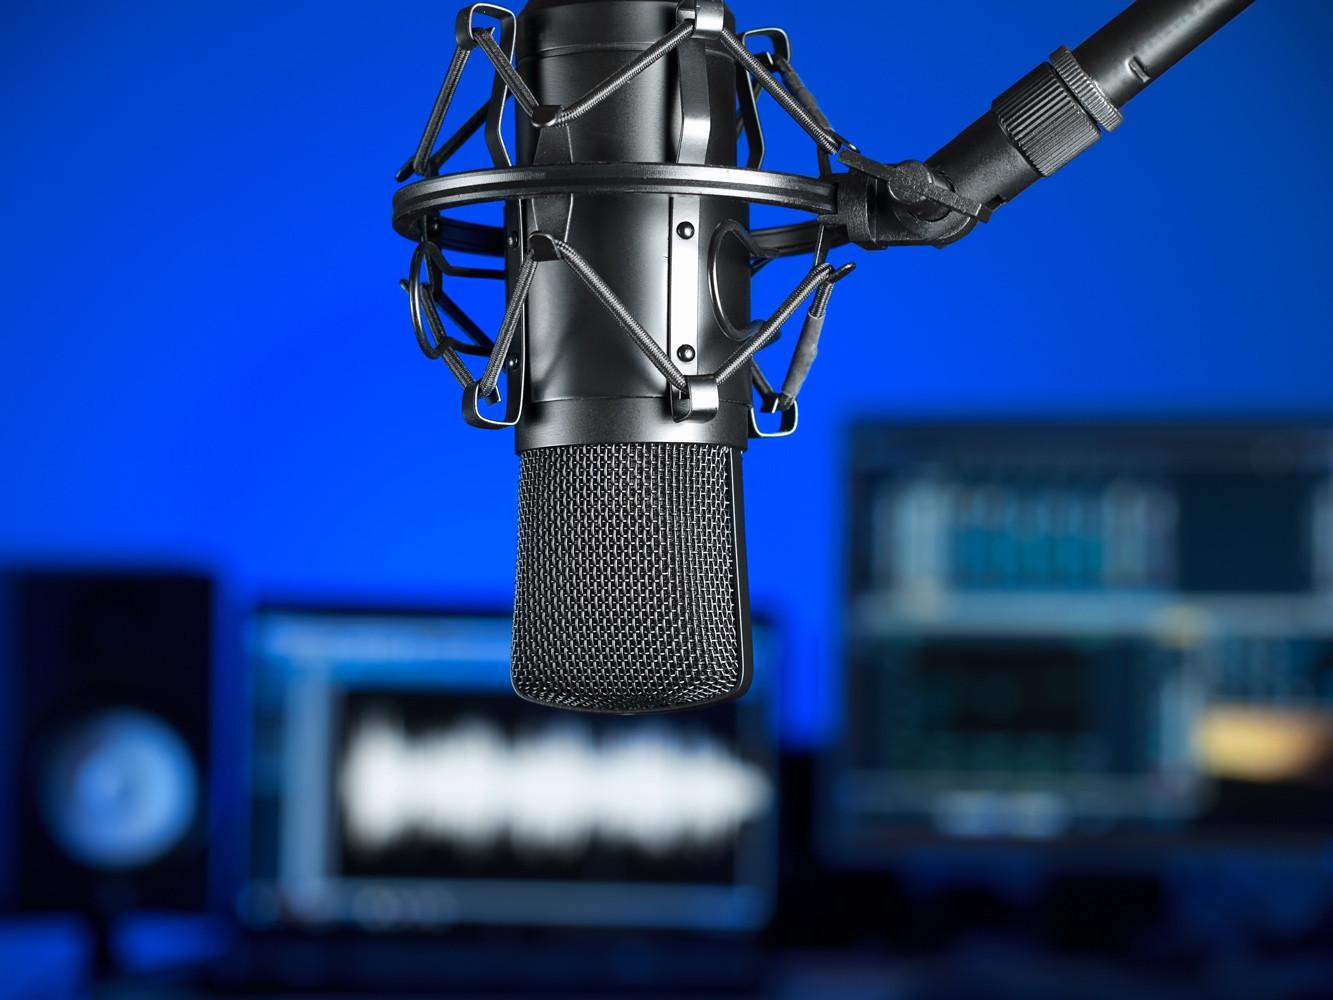 Media and broadcast